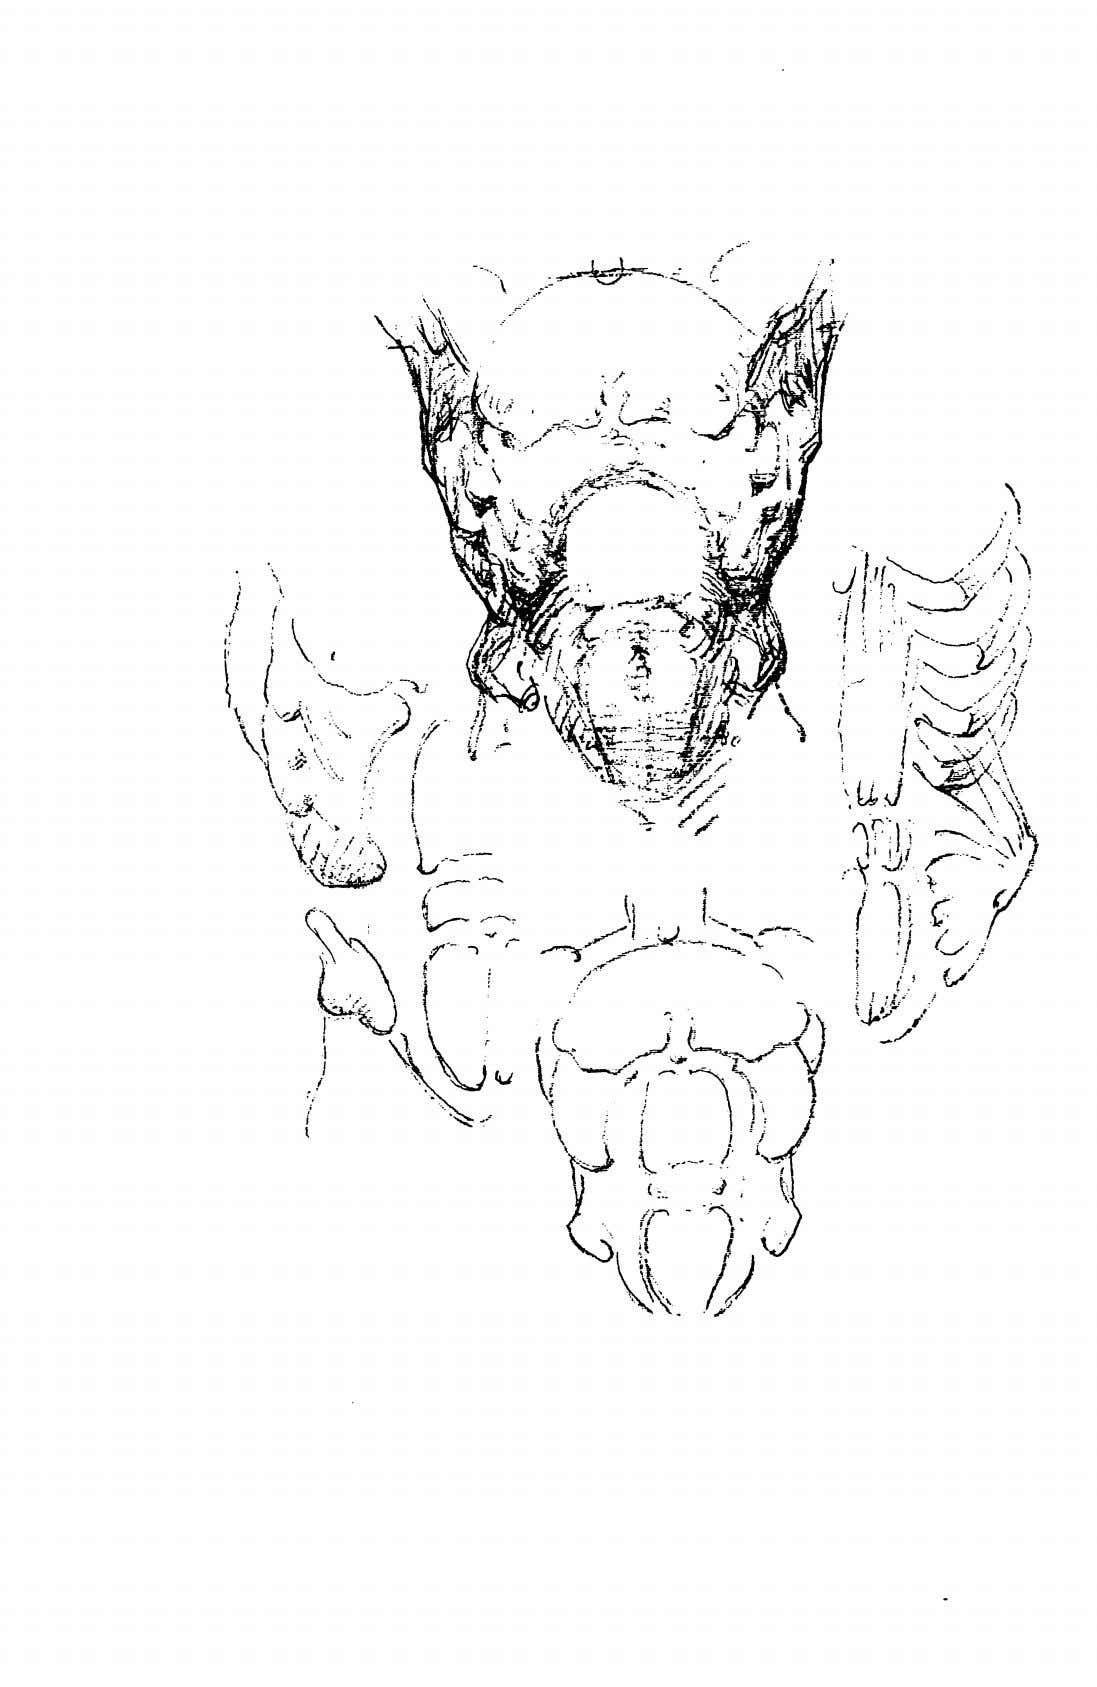 Constructive anatomy in 2020 free novels anatomy books